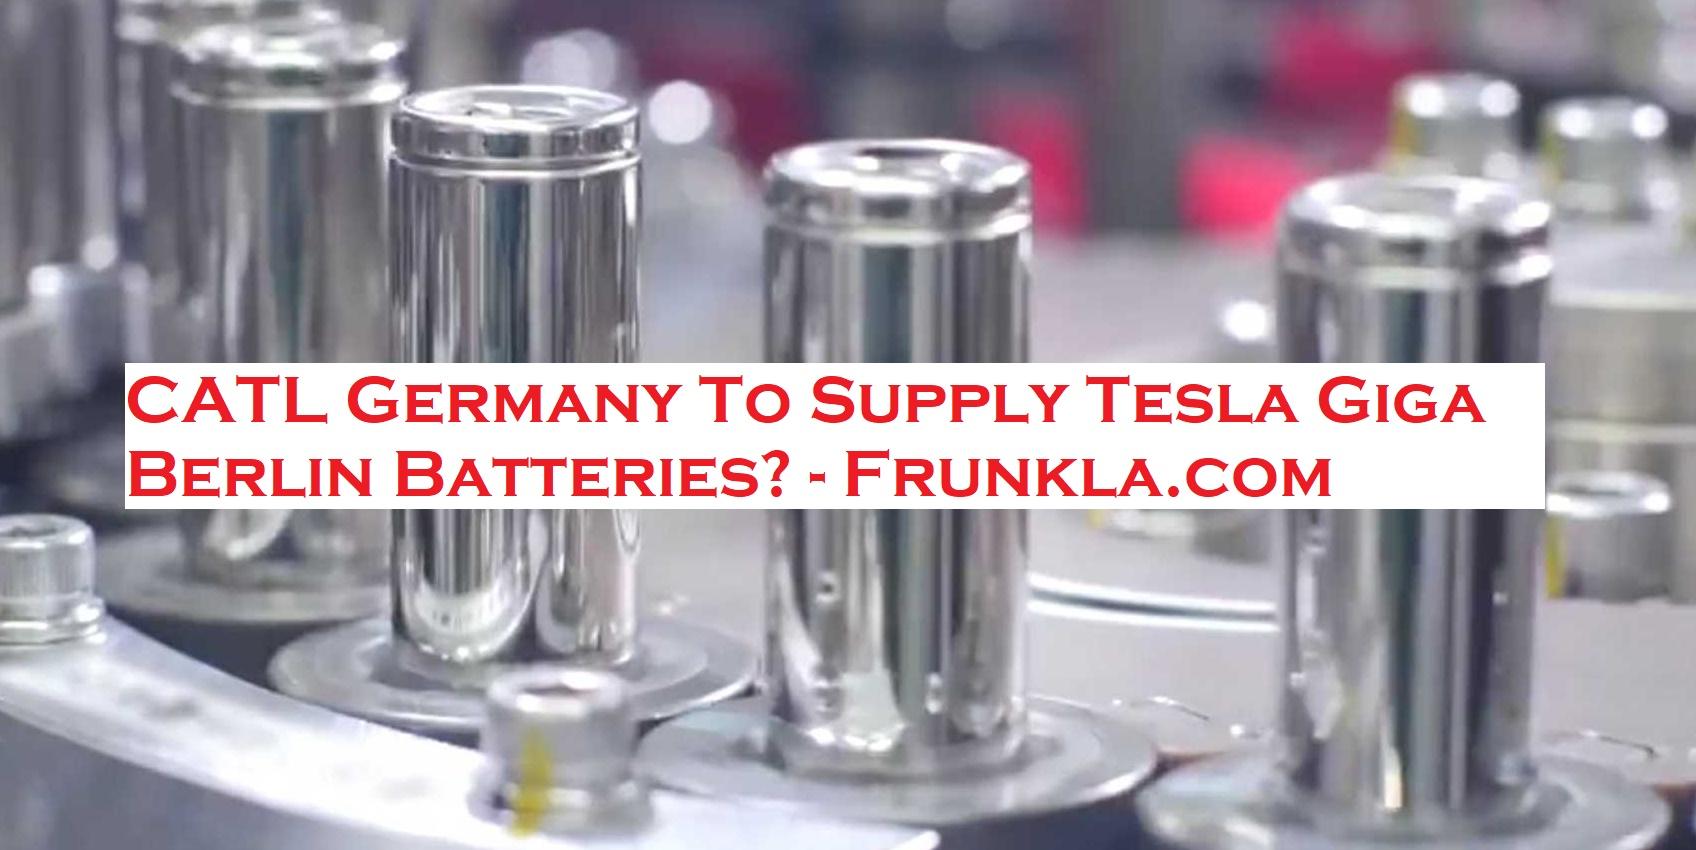 CATL Germany To Supply Tesla Giga Berlin Batteries?